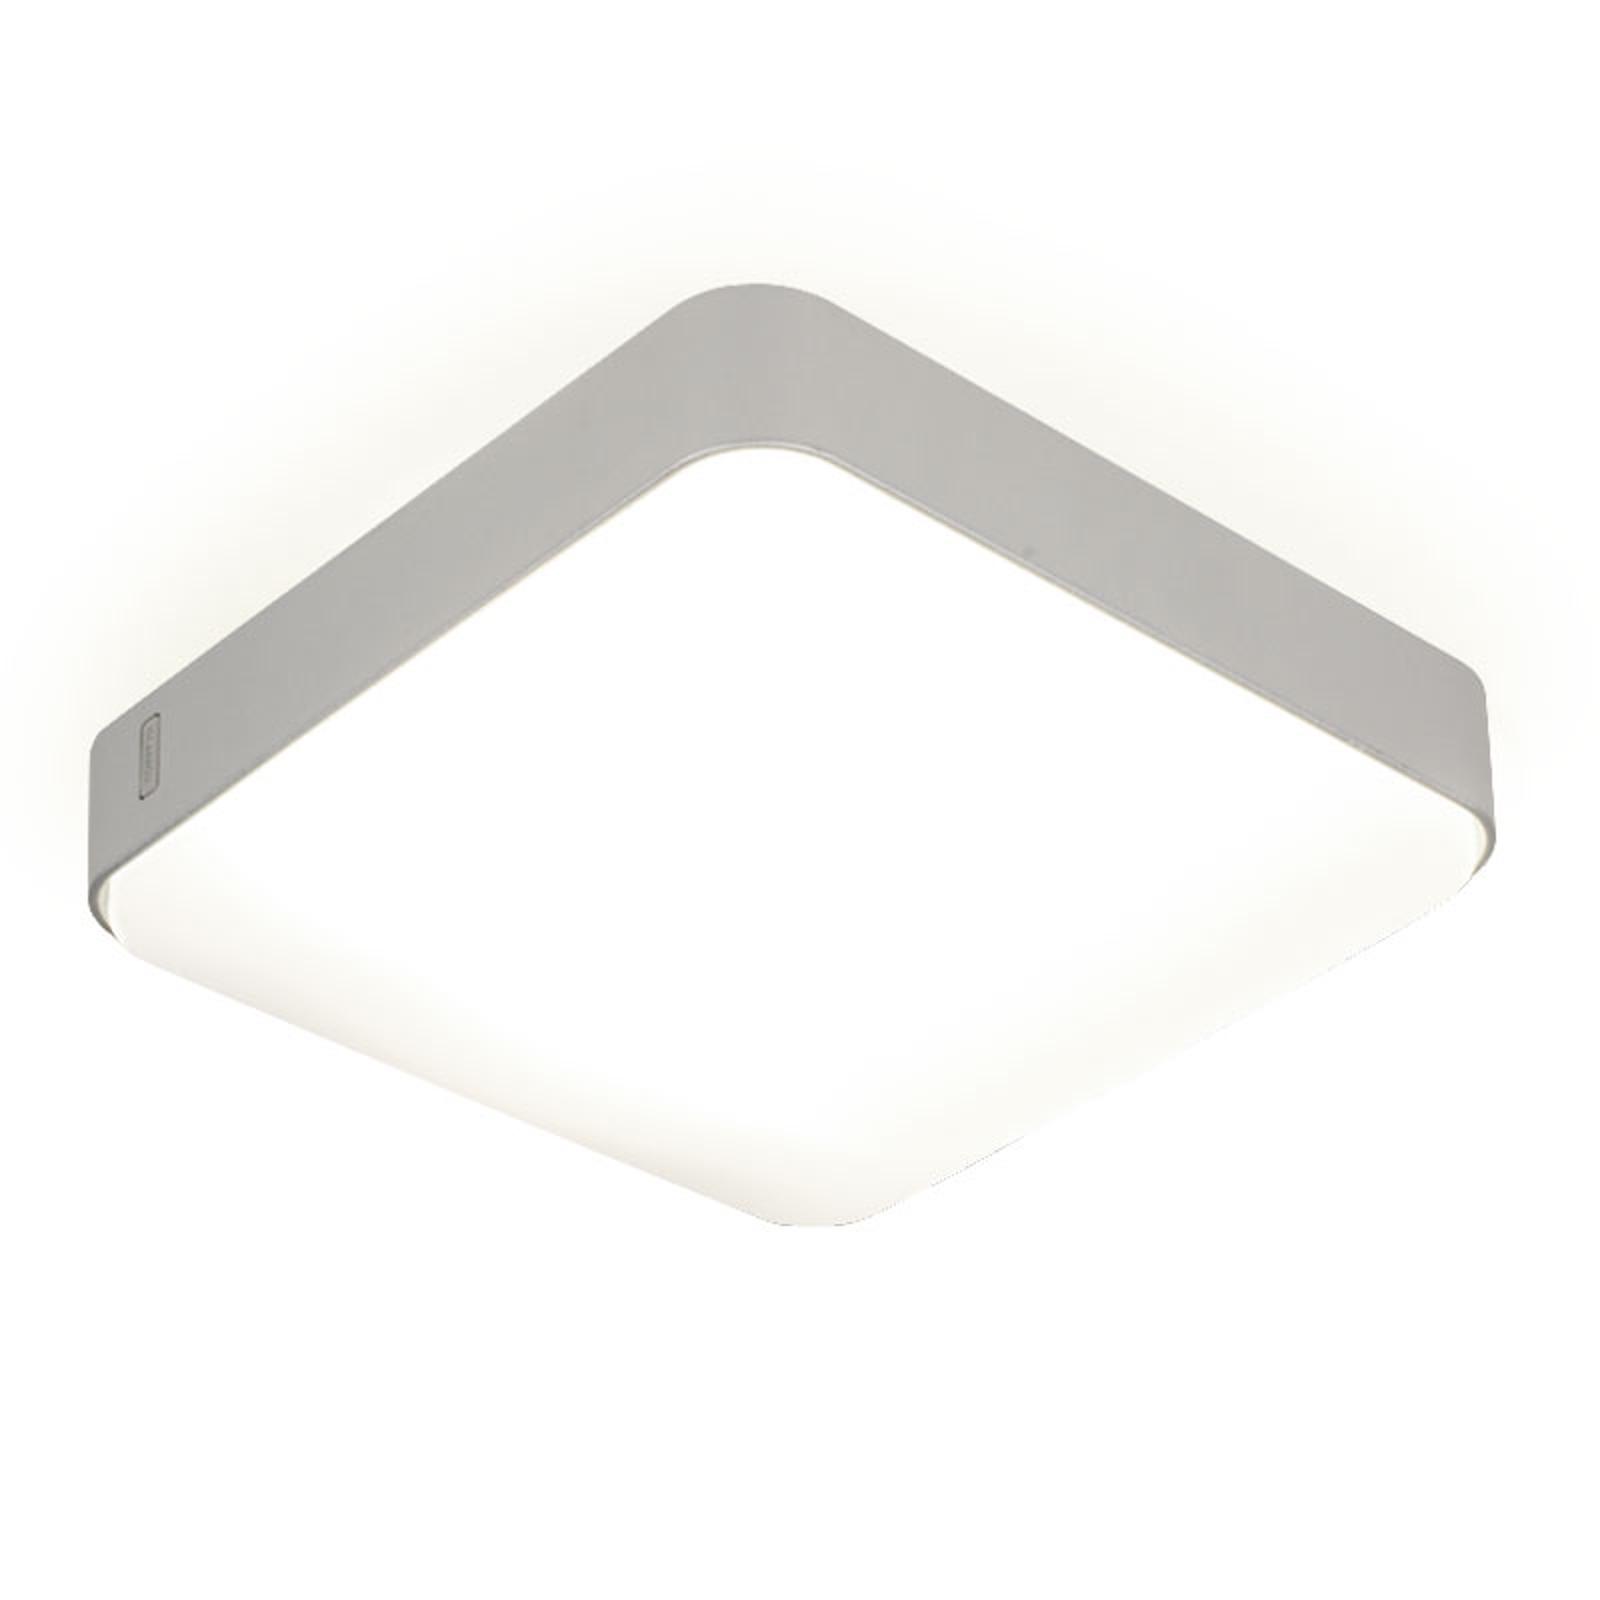 Lampa sufitowa LED A20-SQ, 40x40 cm, 4000K